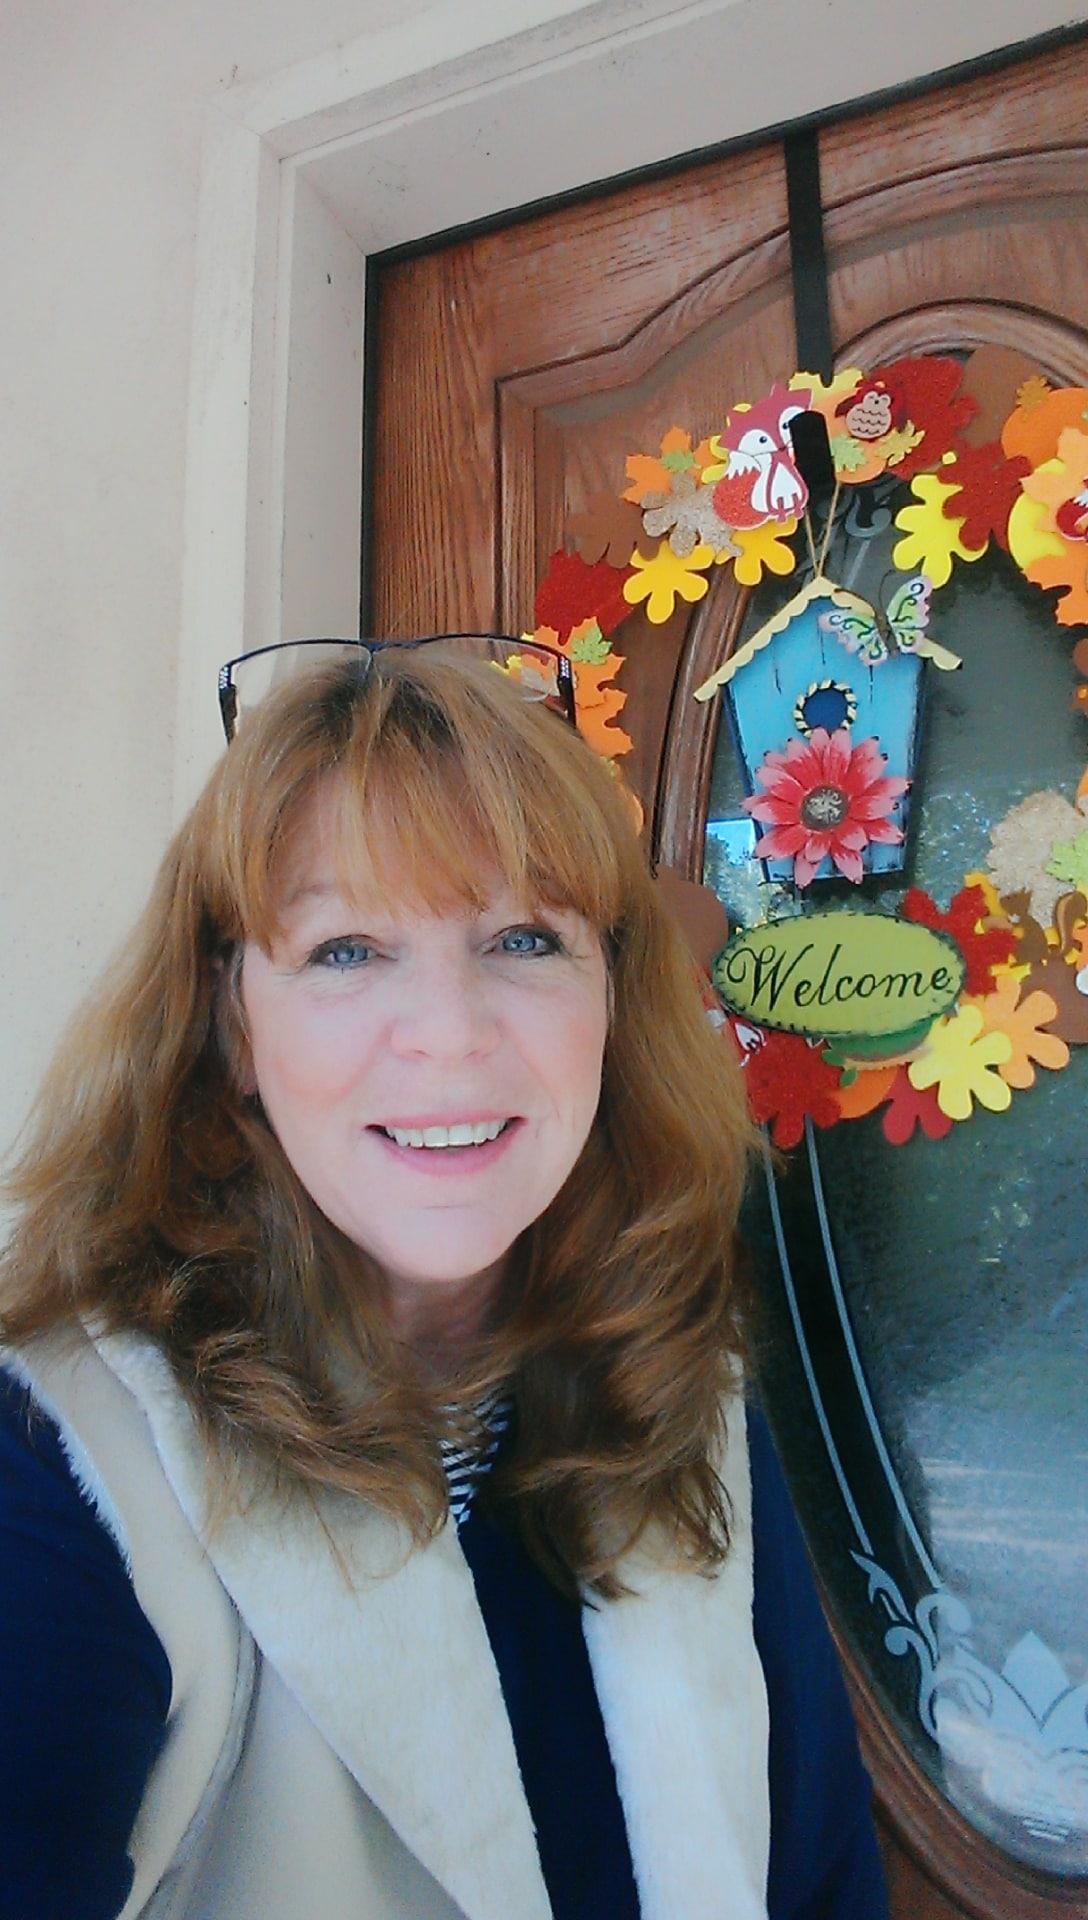 Barbara from Annapolis